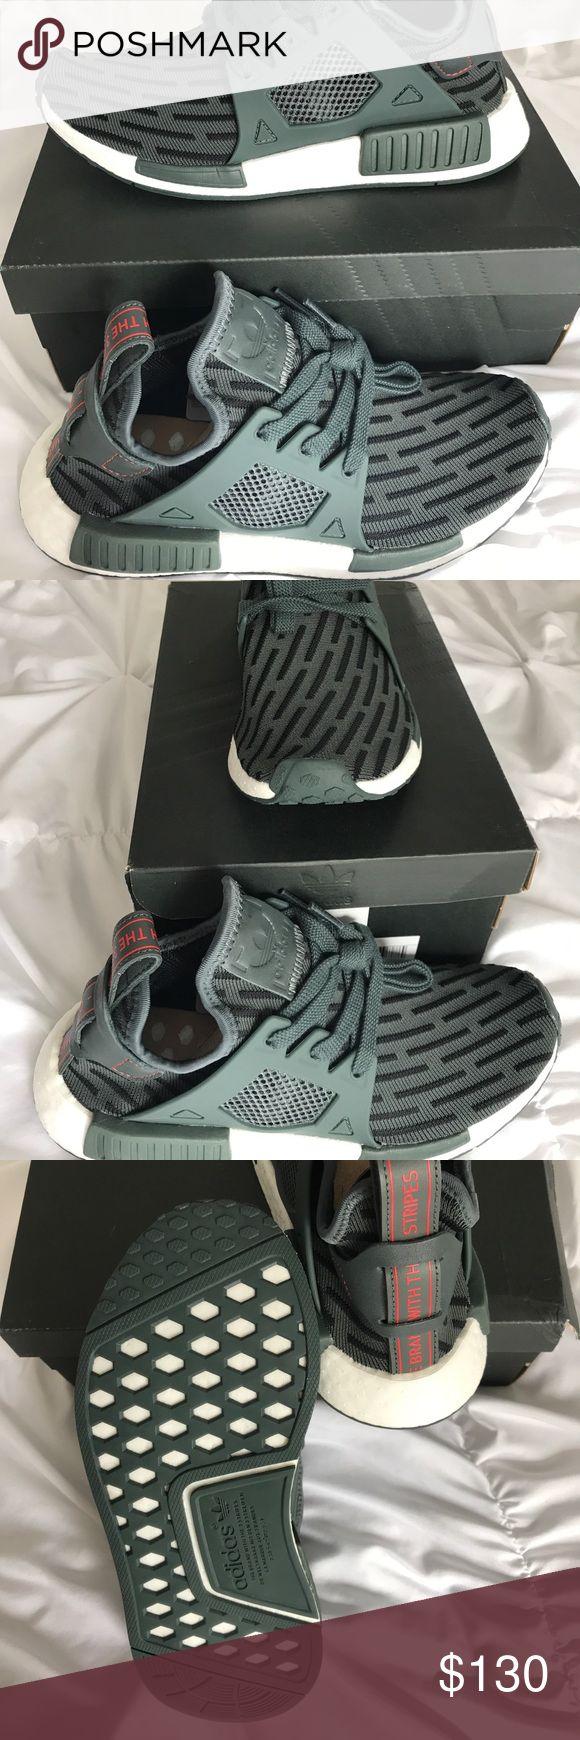 Women 6.5 Adidas Brand new adidas, never worn.  Original price $160 adidas Shoes Athletic Shoes http://feedproxy.google.com/fashionshoes1